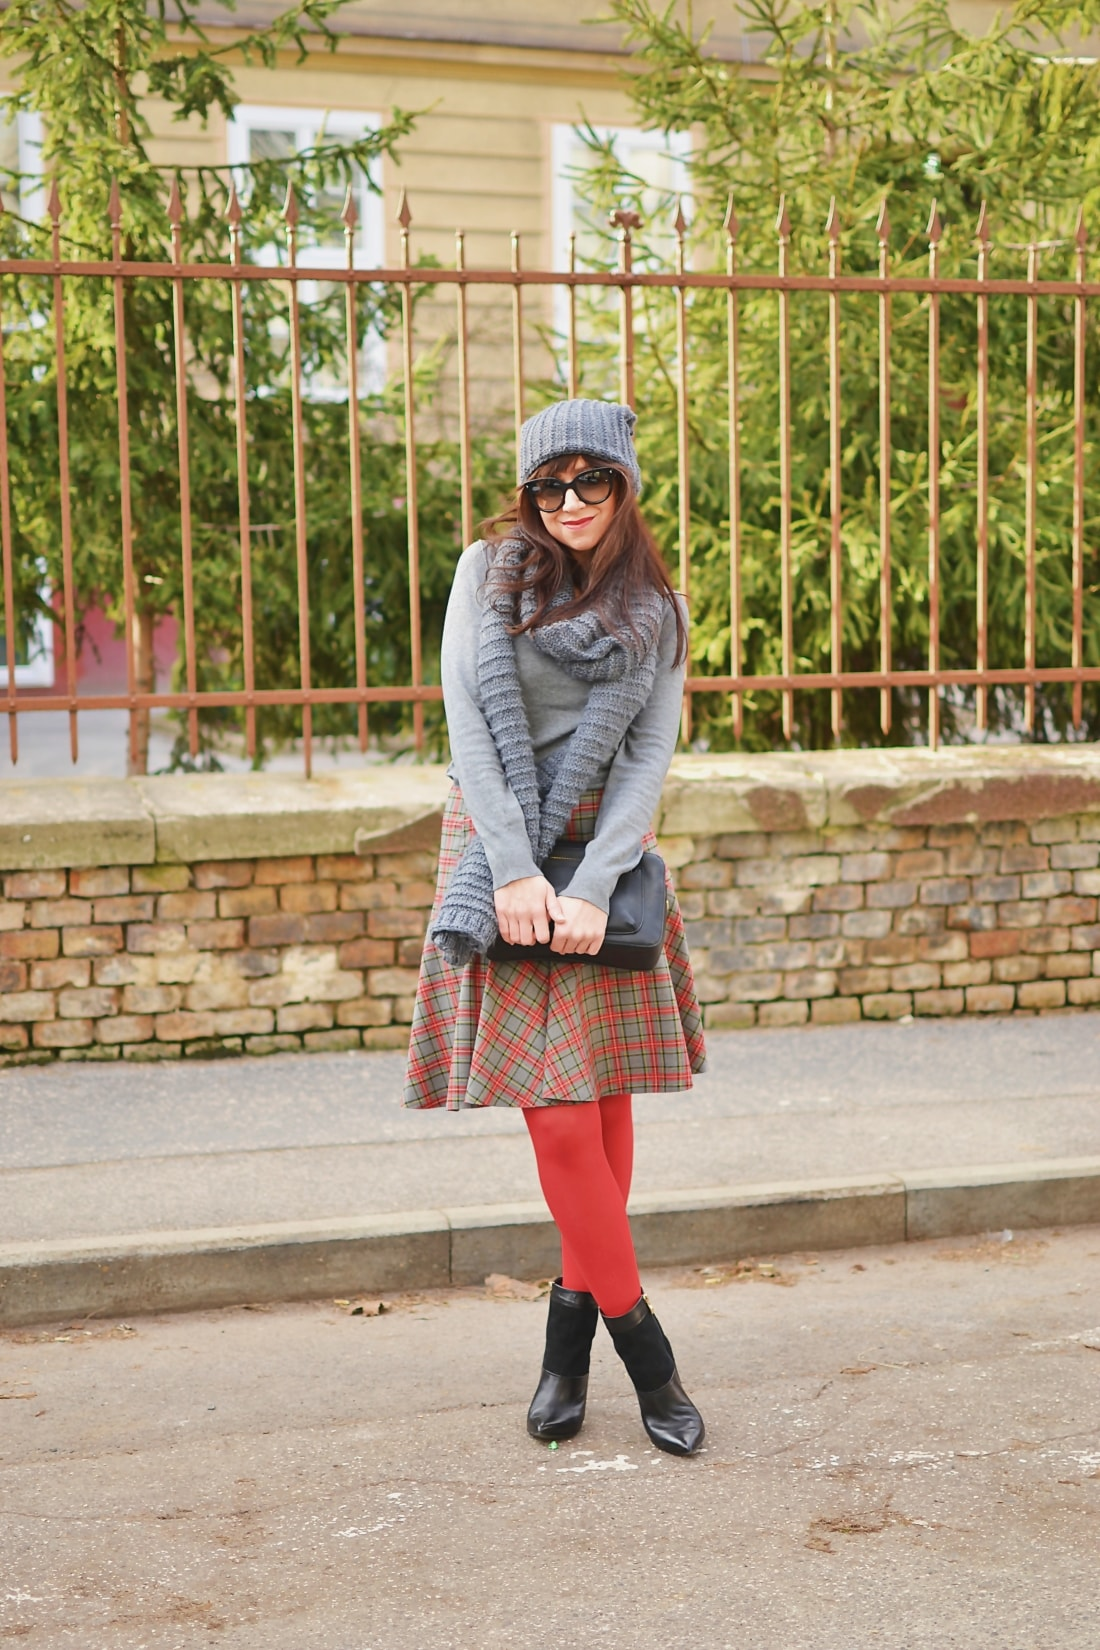 Červená_Katharine-fashion is beautiful_blog 8_Červené pančuchy_Červený kabát_Károvaná sukňa_Katarína Jakubčová_Fashion blogger_Outfit